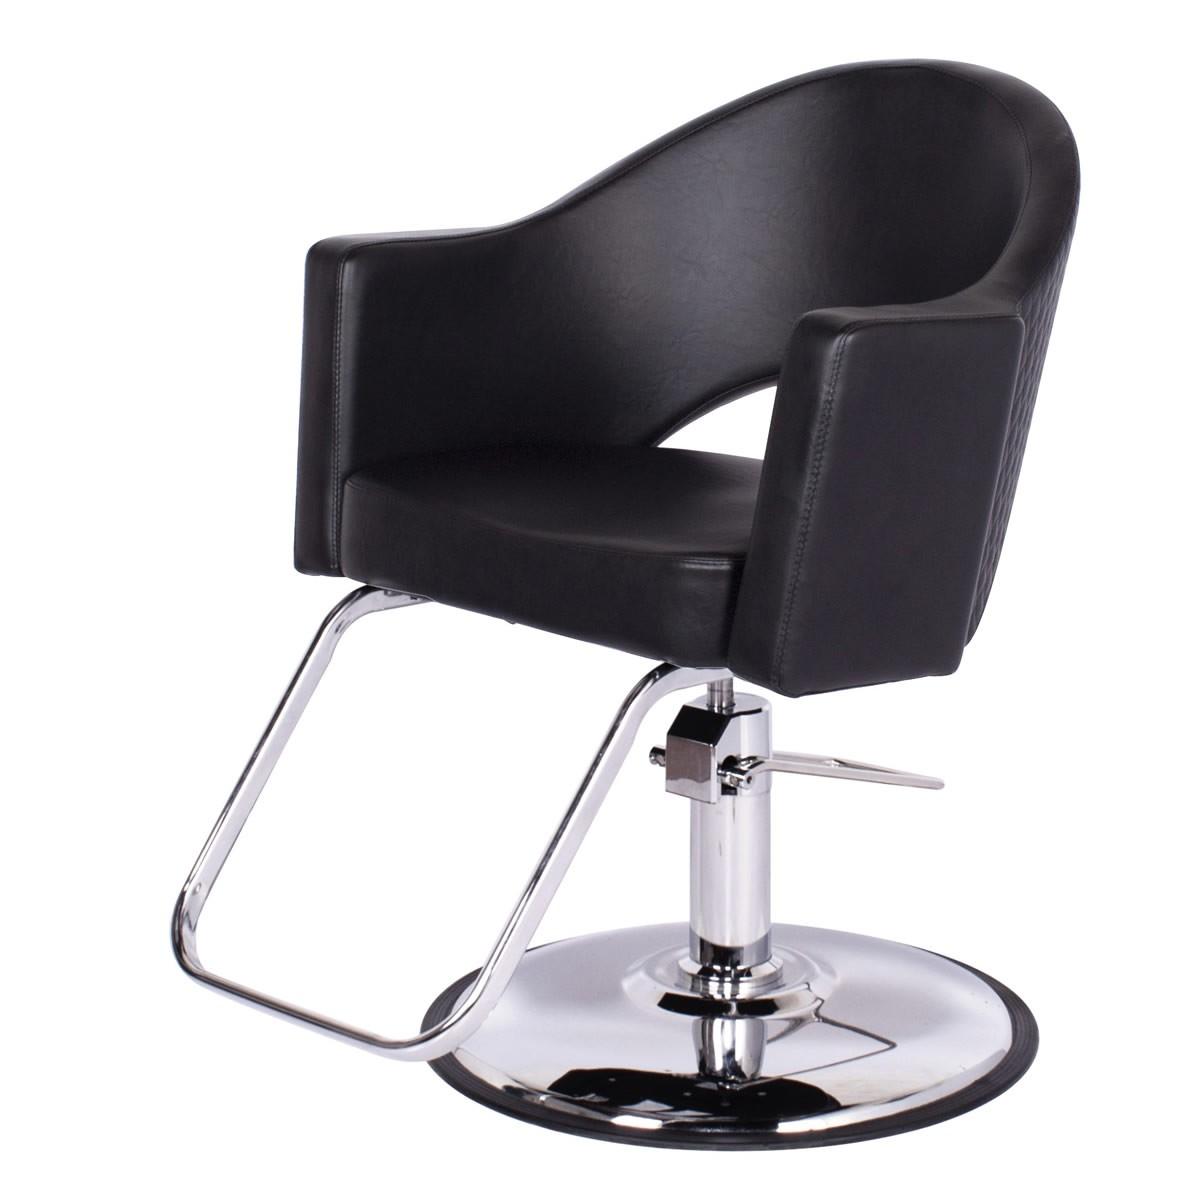 """FONTAINEBLEAU"" Italian Styling Chair, Italian Salon Chair, Italian Salon Furniture"